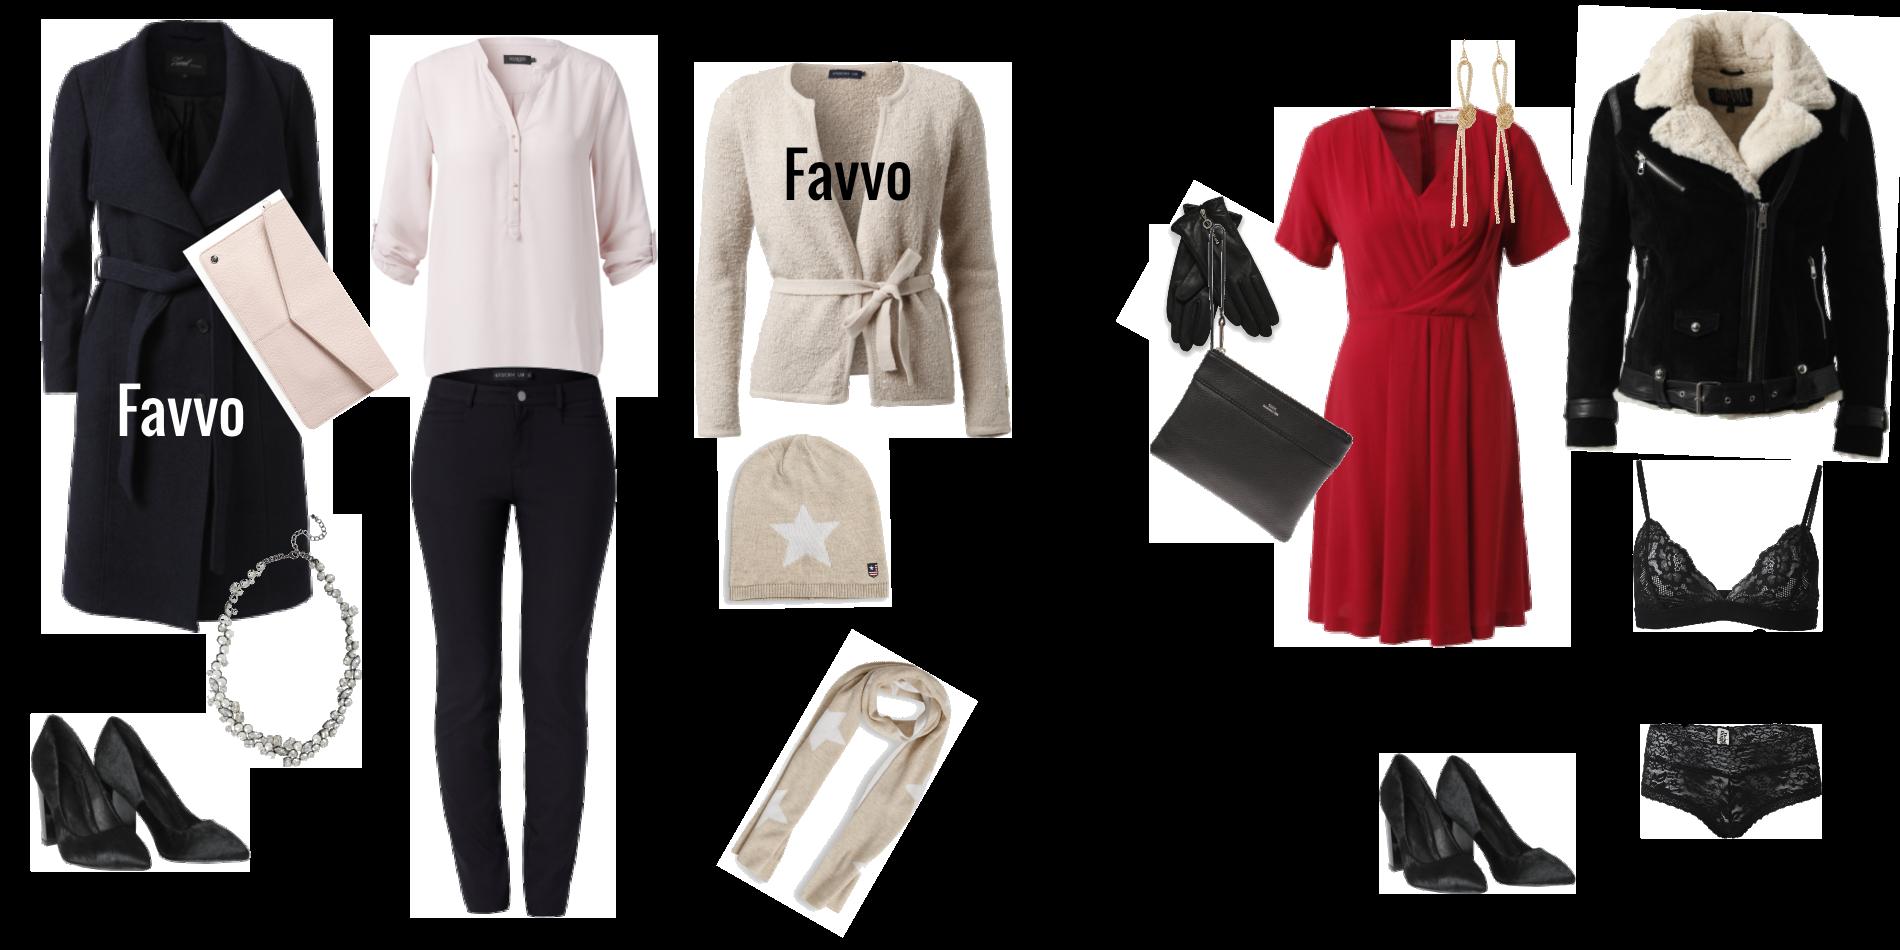 Två snygga outfits